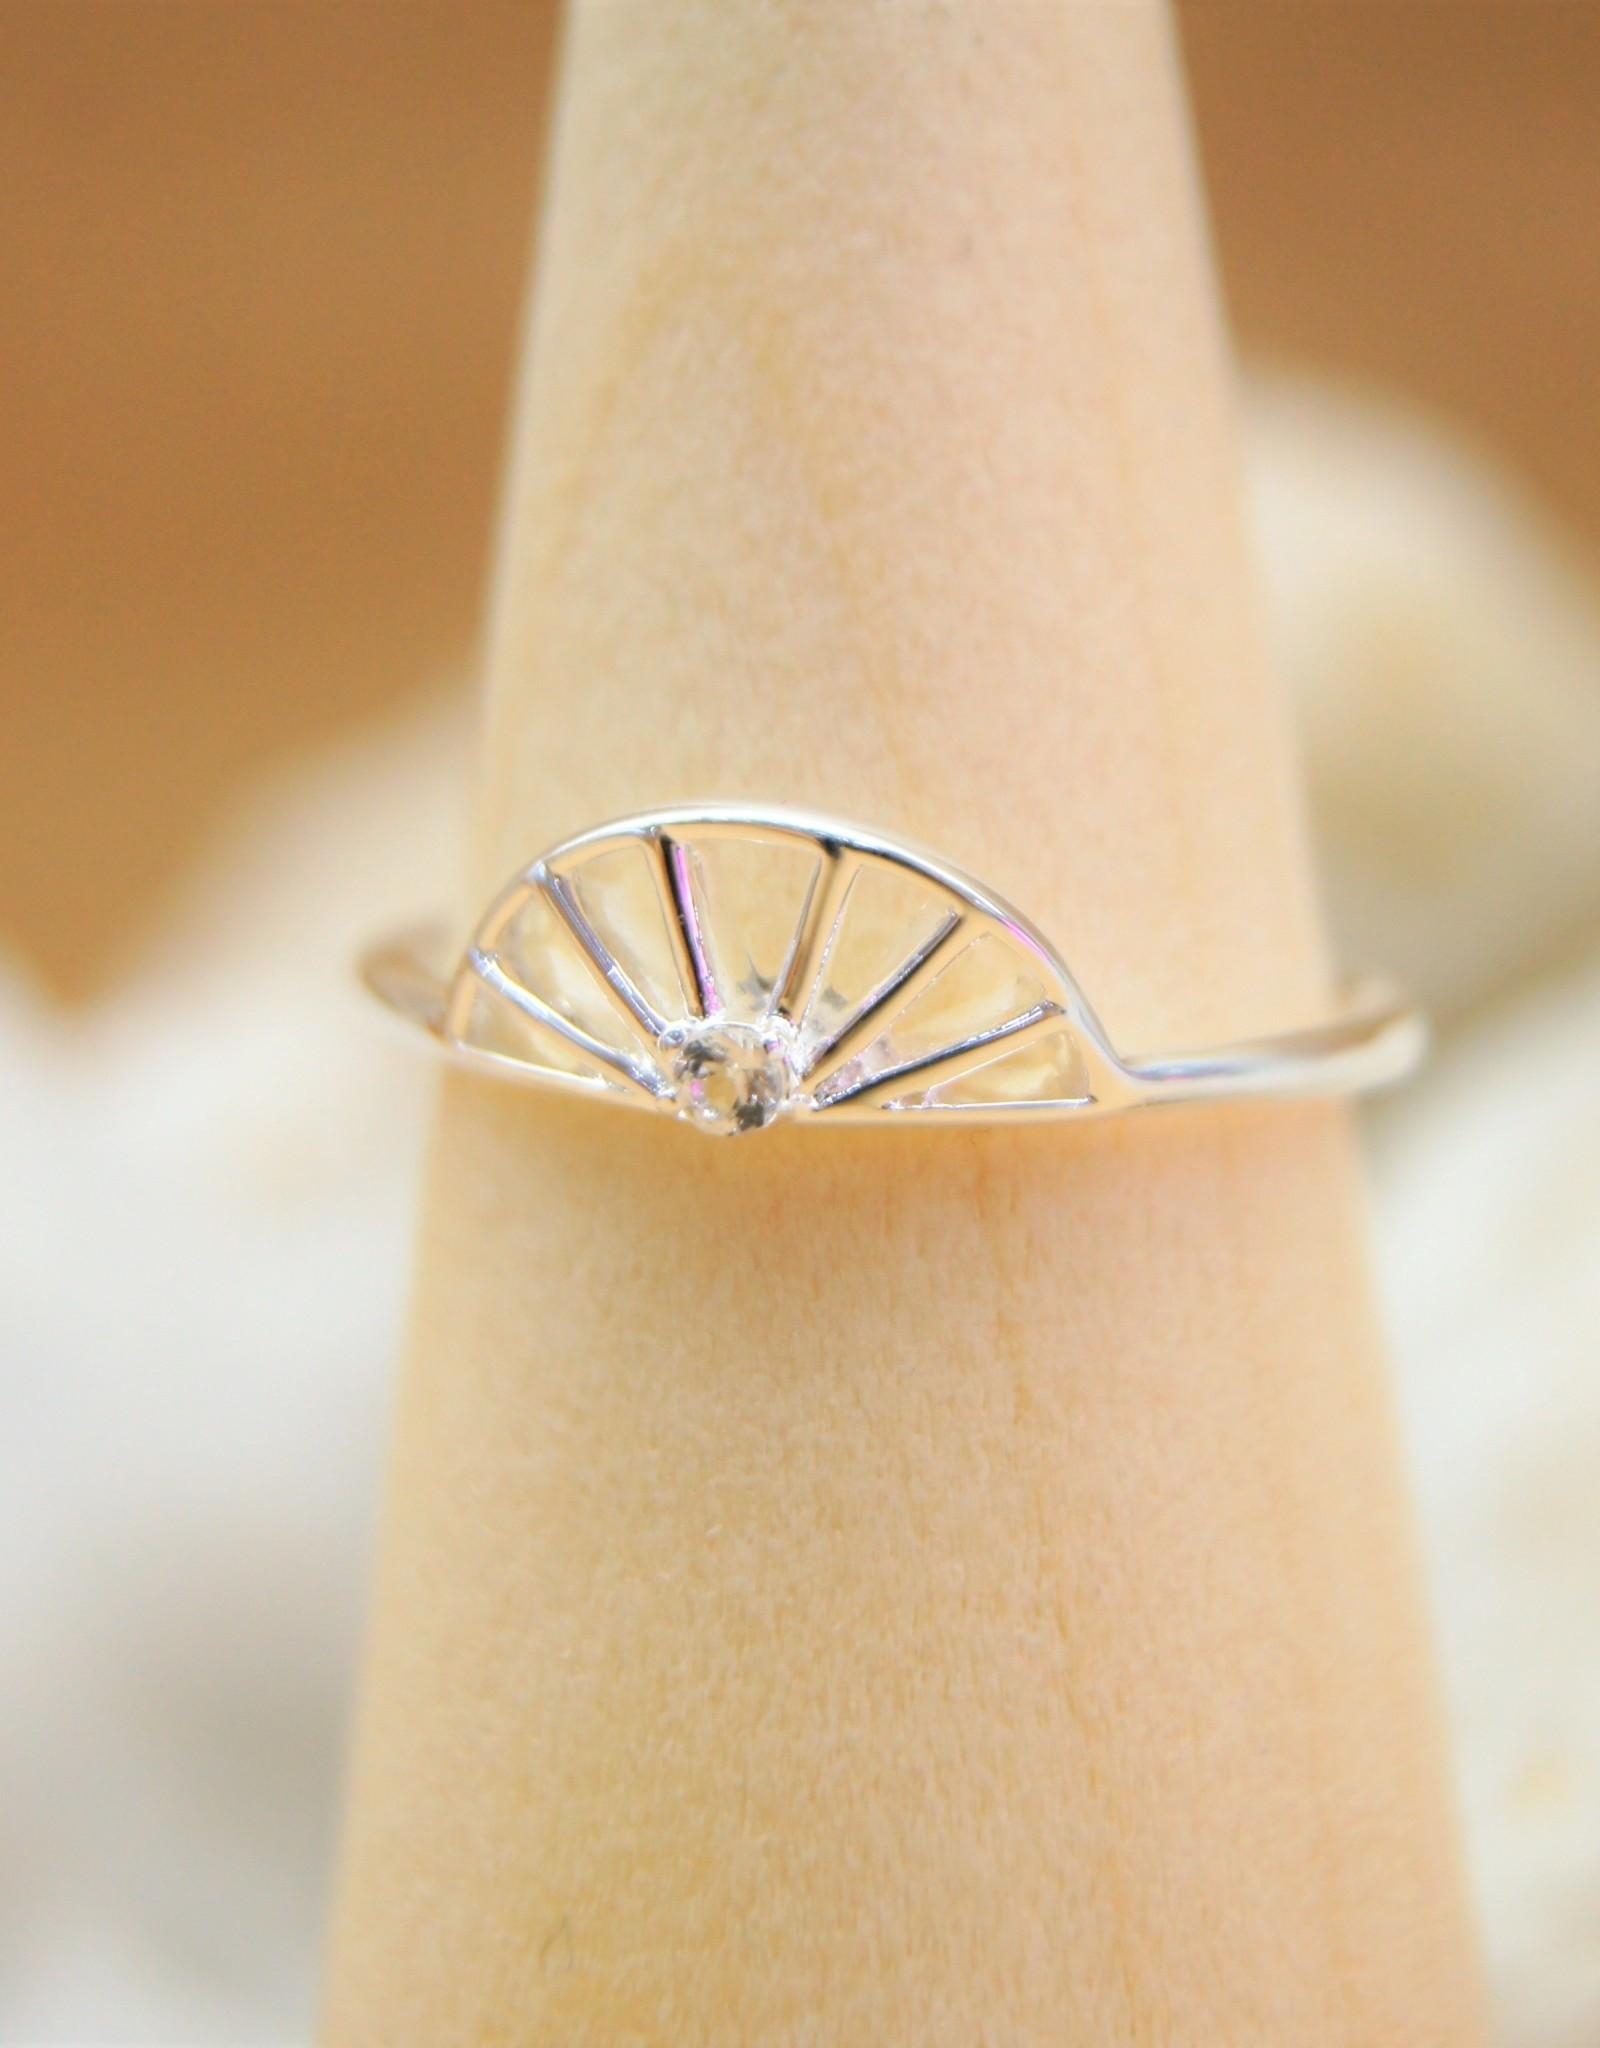 Tashi Sun with Stone Ring